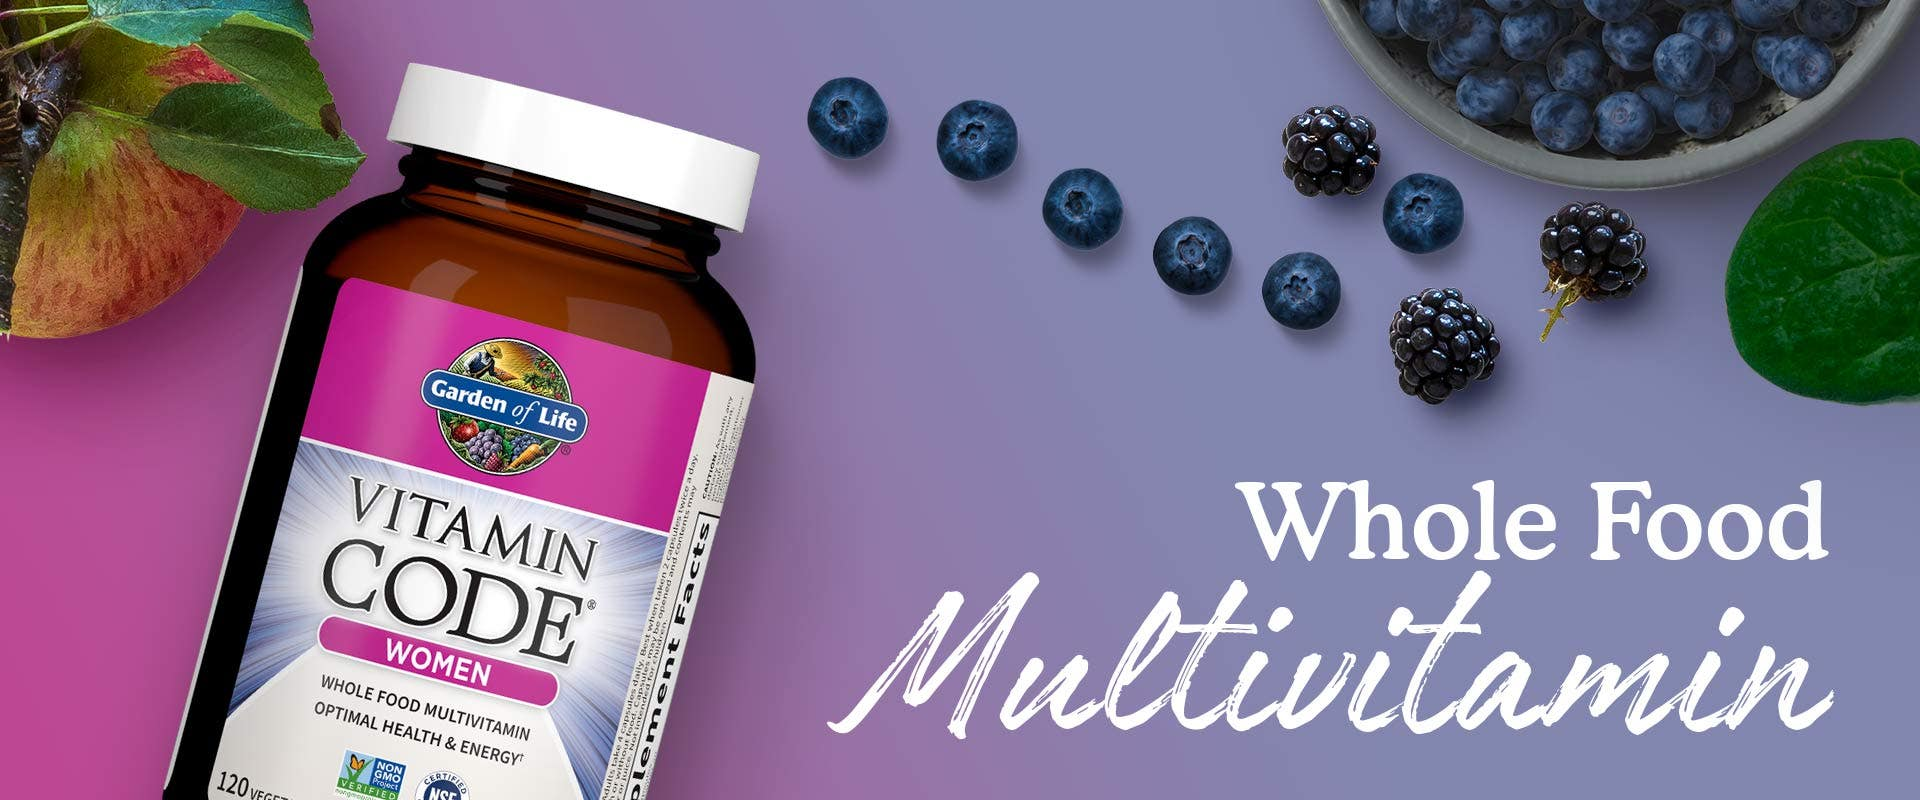 Women's Multivitamin Vitamin Code Garden of Life